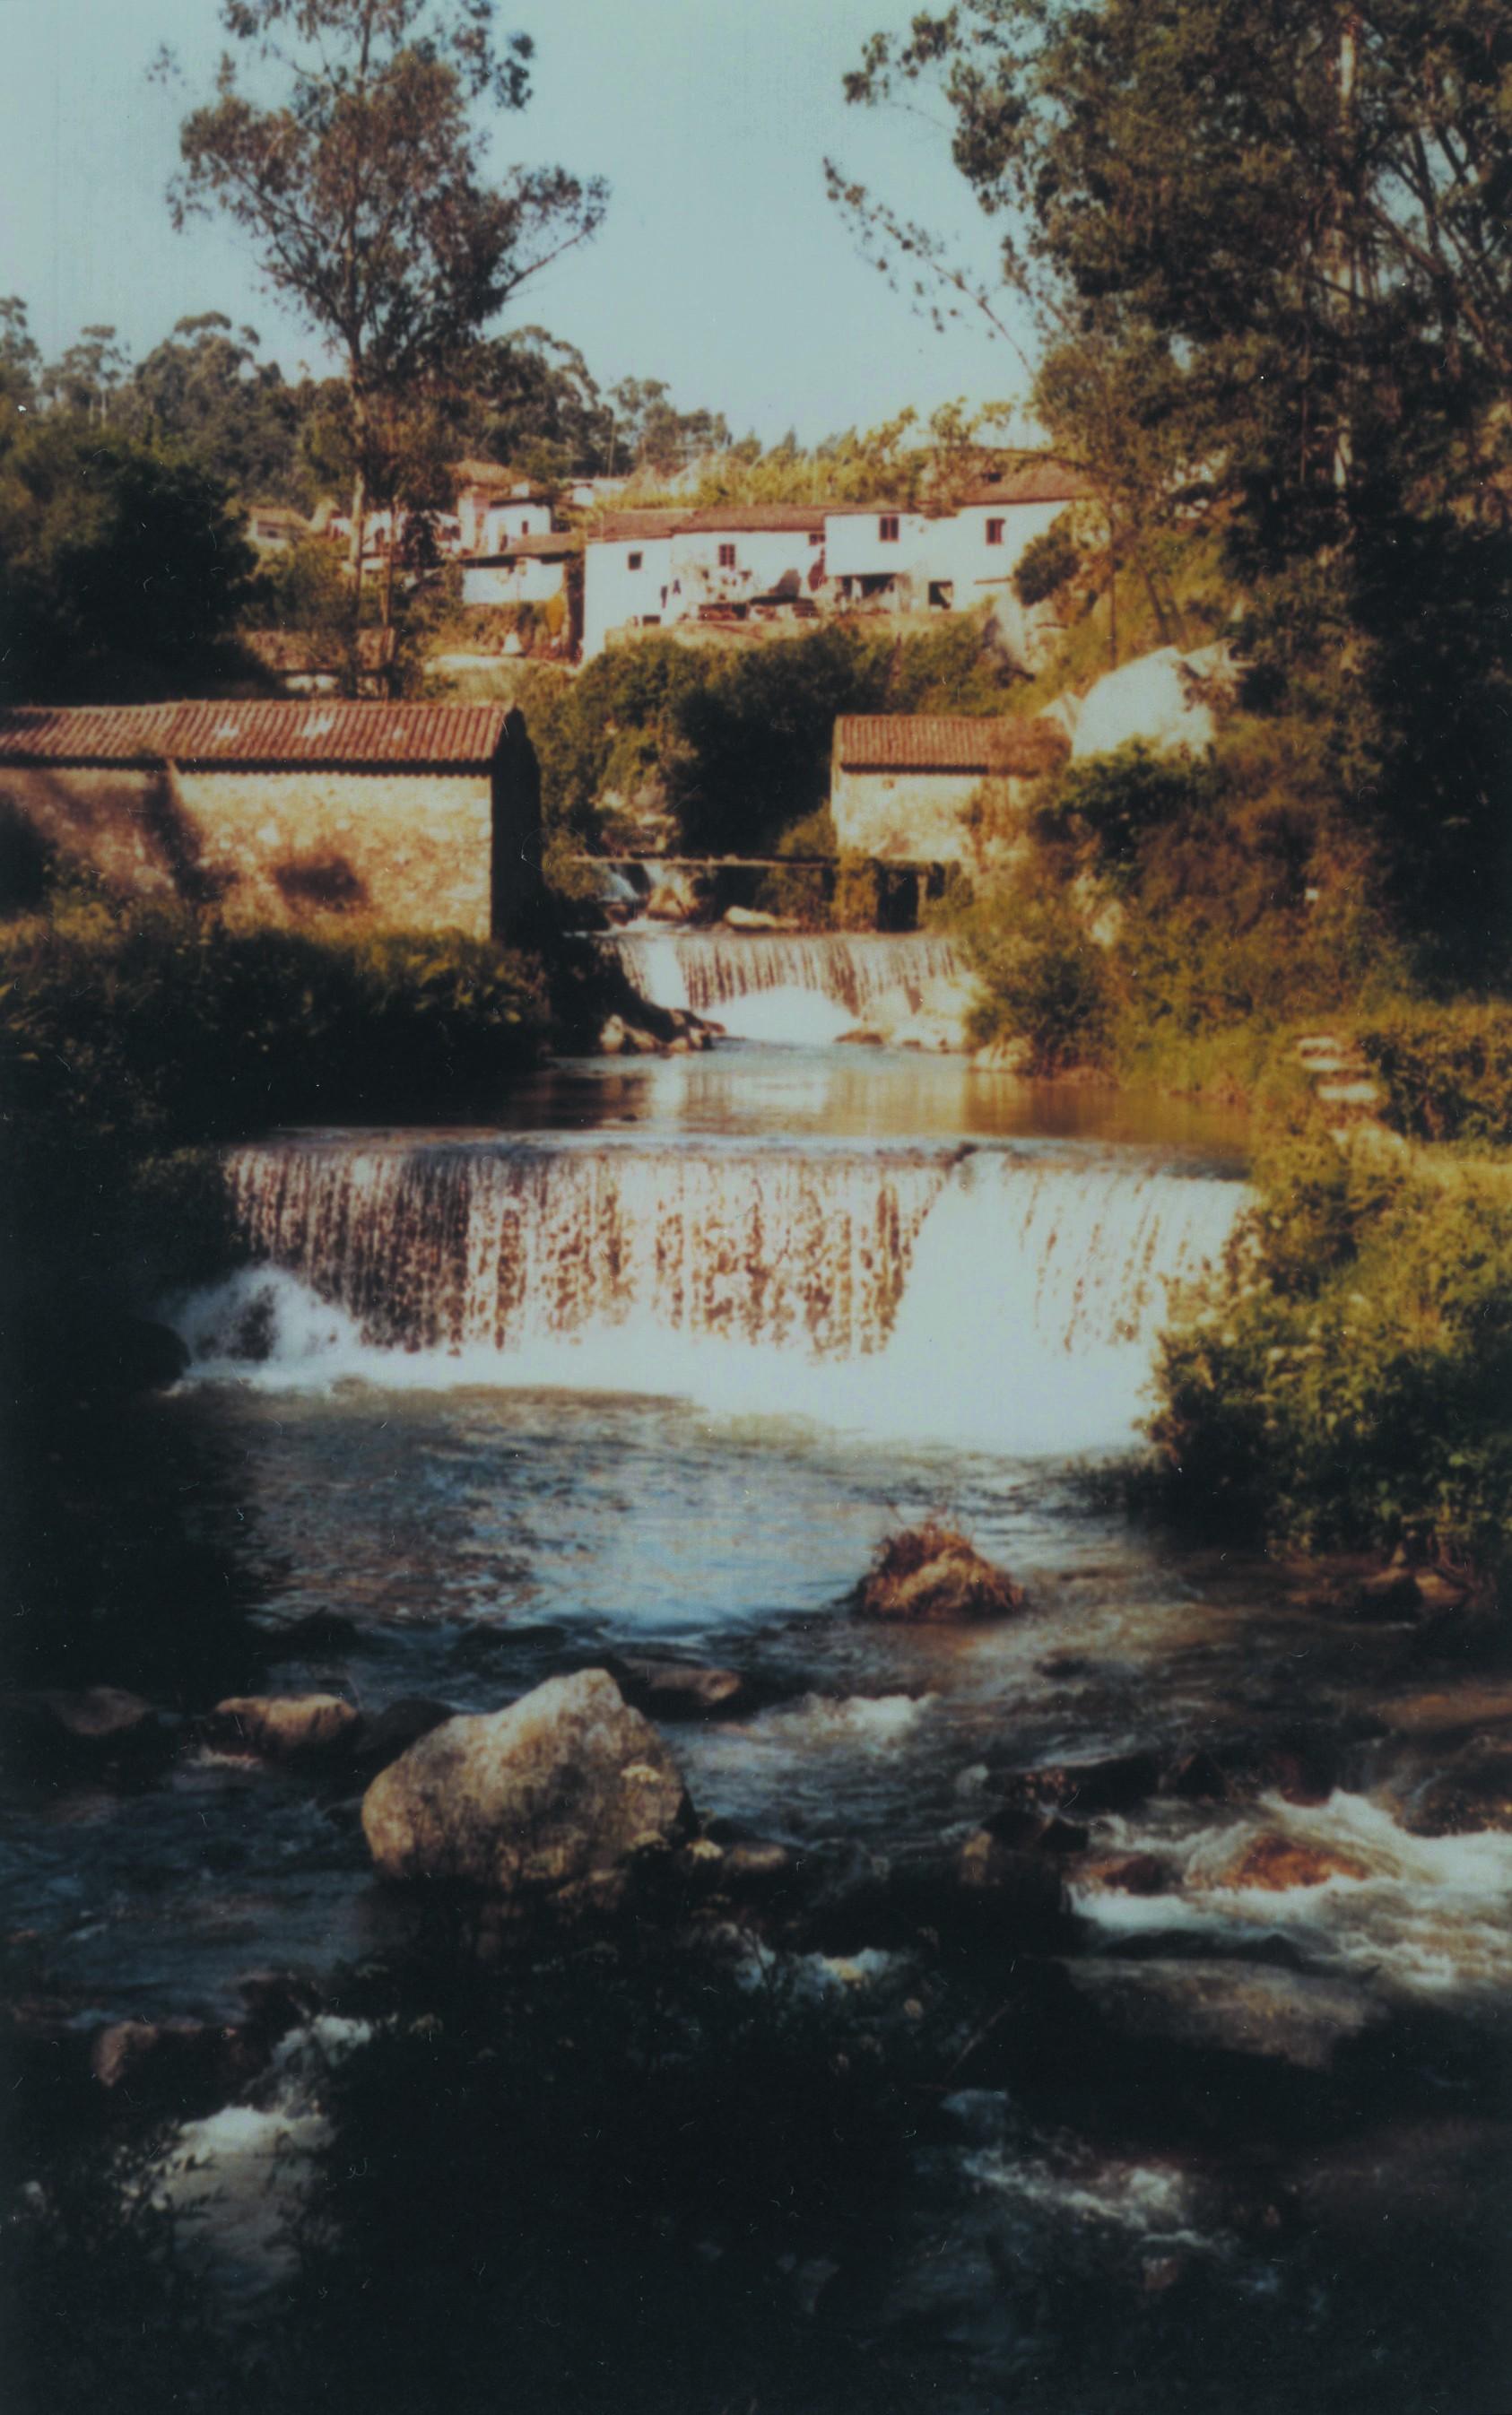 Moinhos do Antuã, Ul (1985)